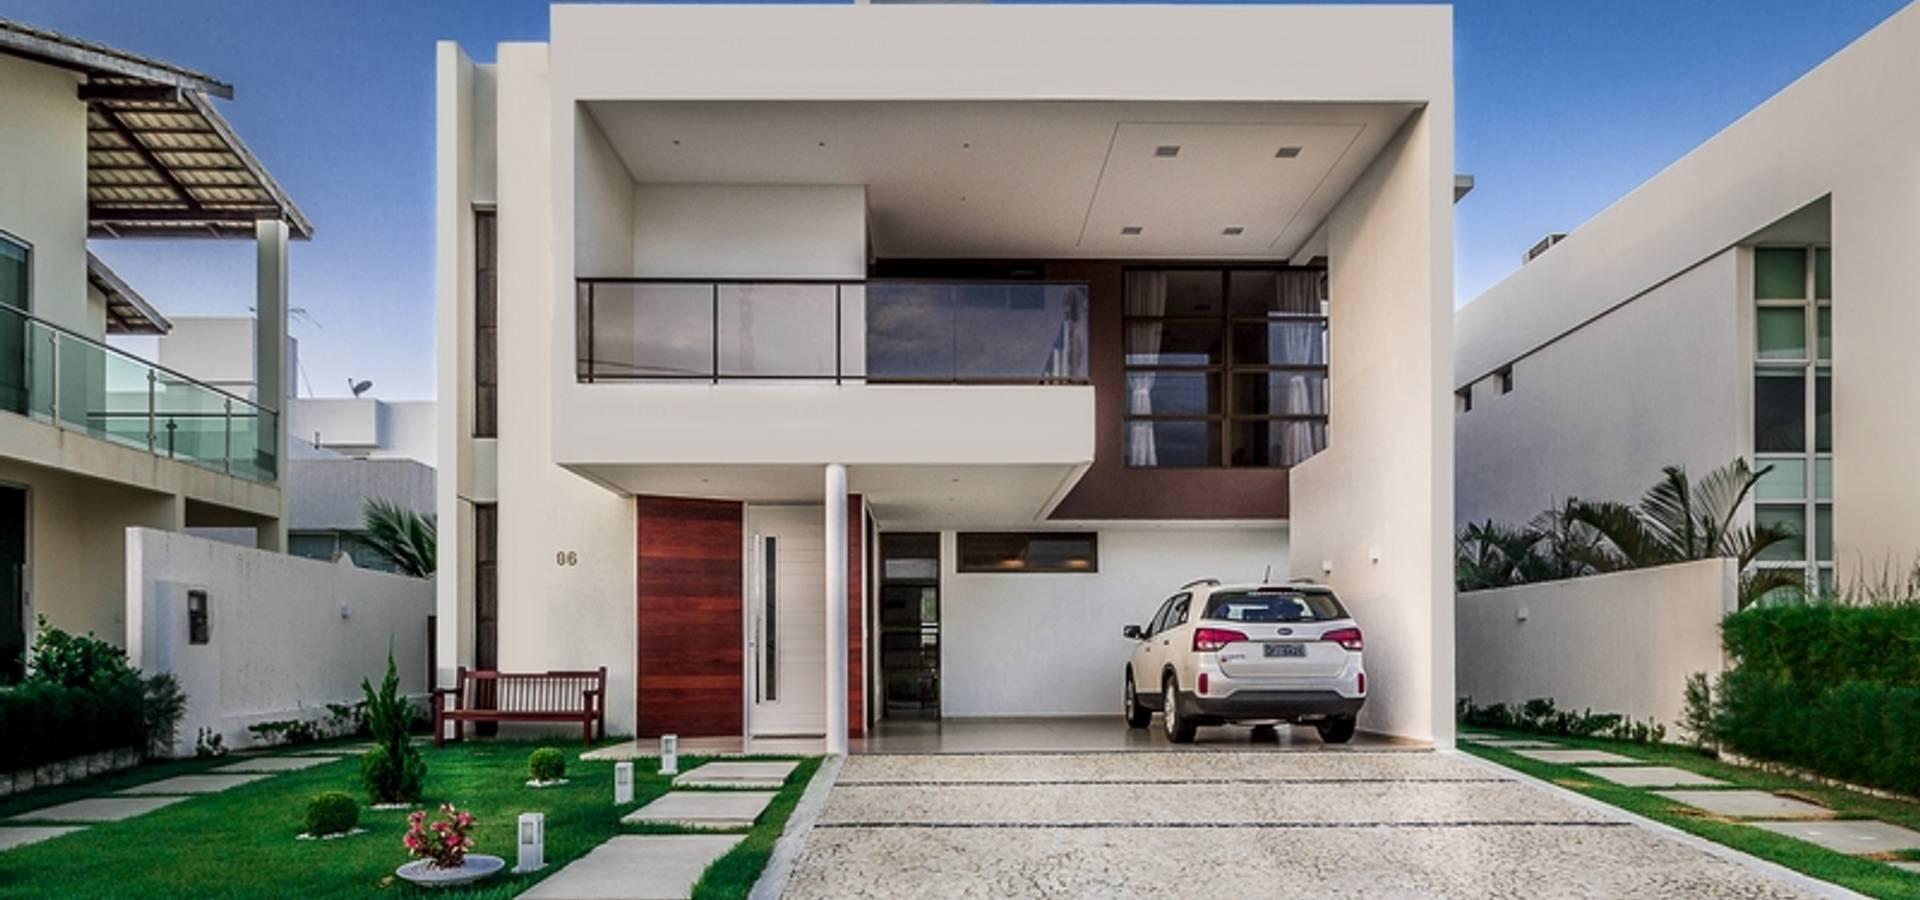 Marina Brasil Arquitetura